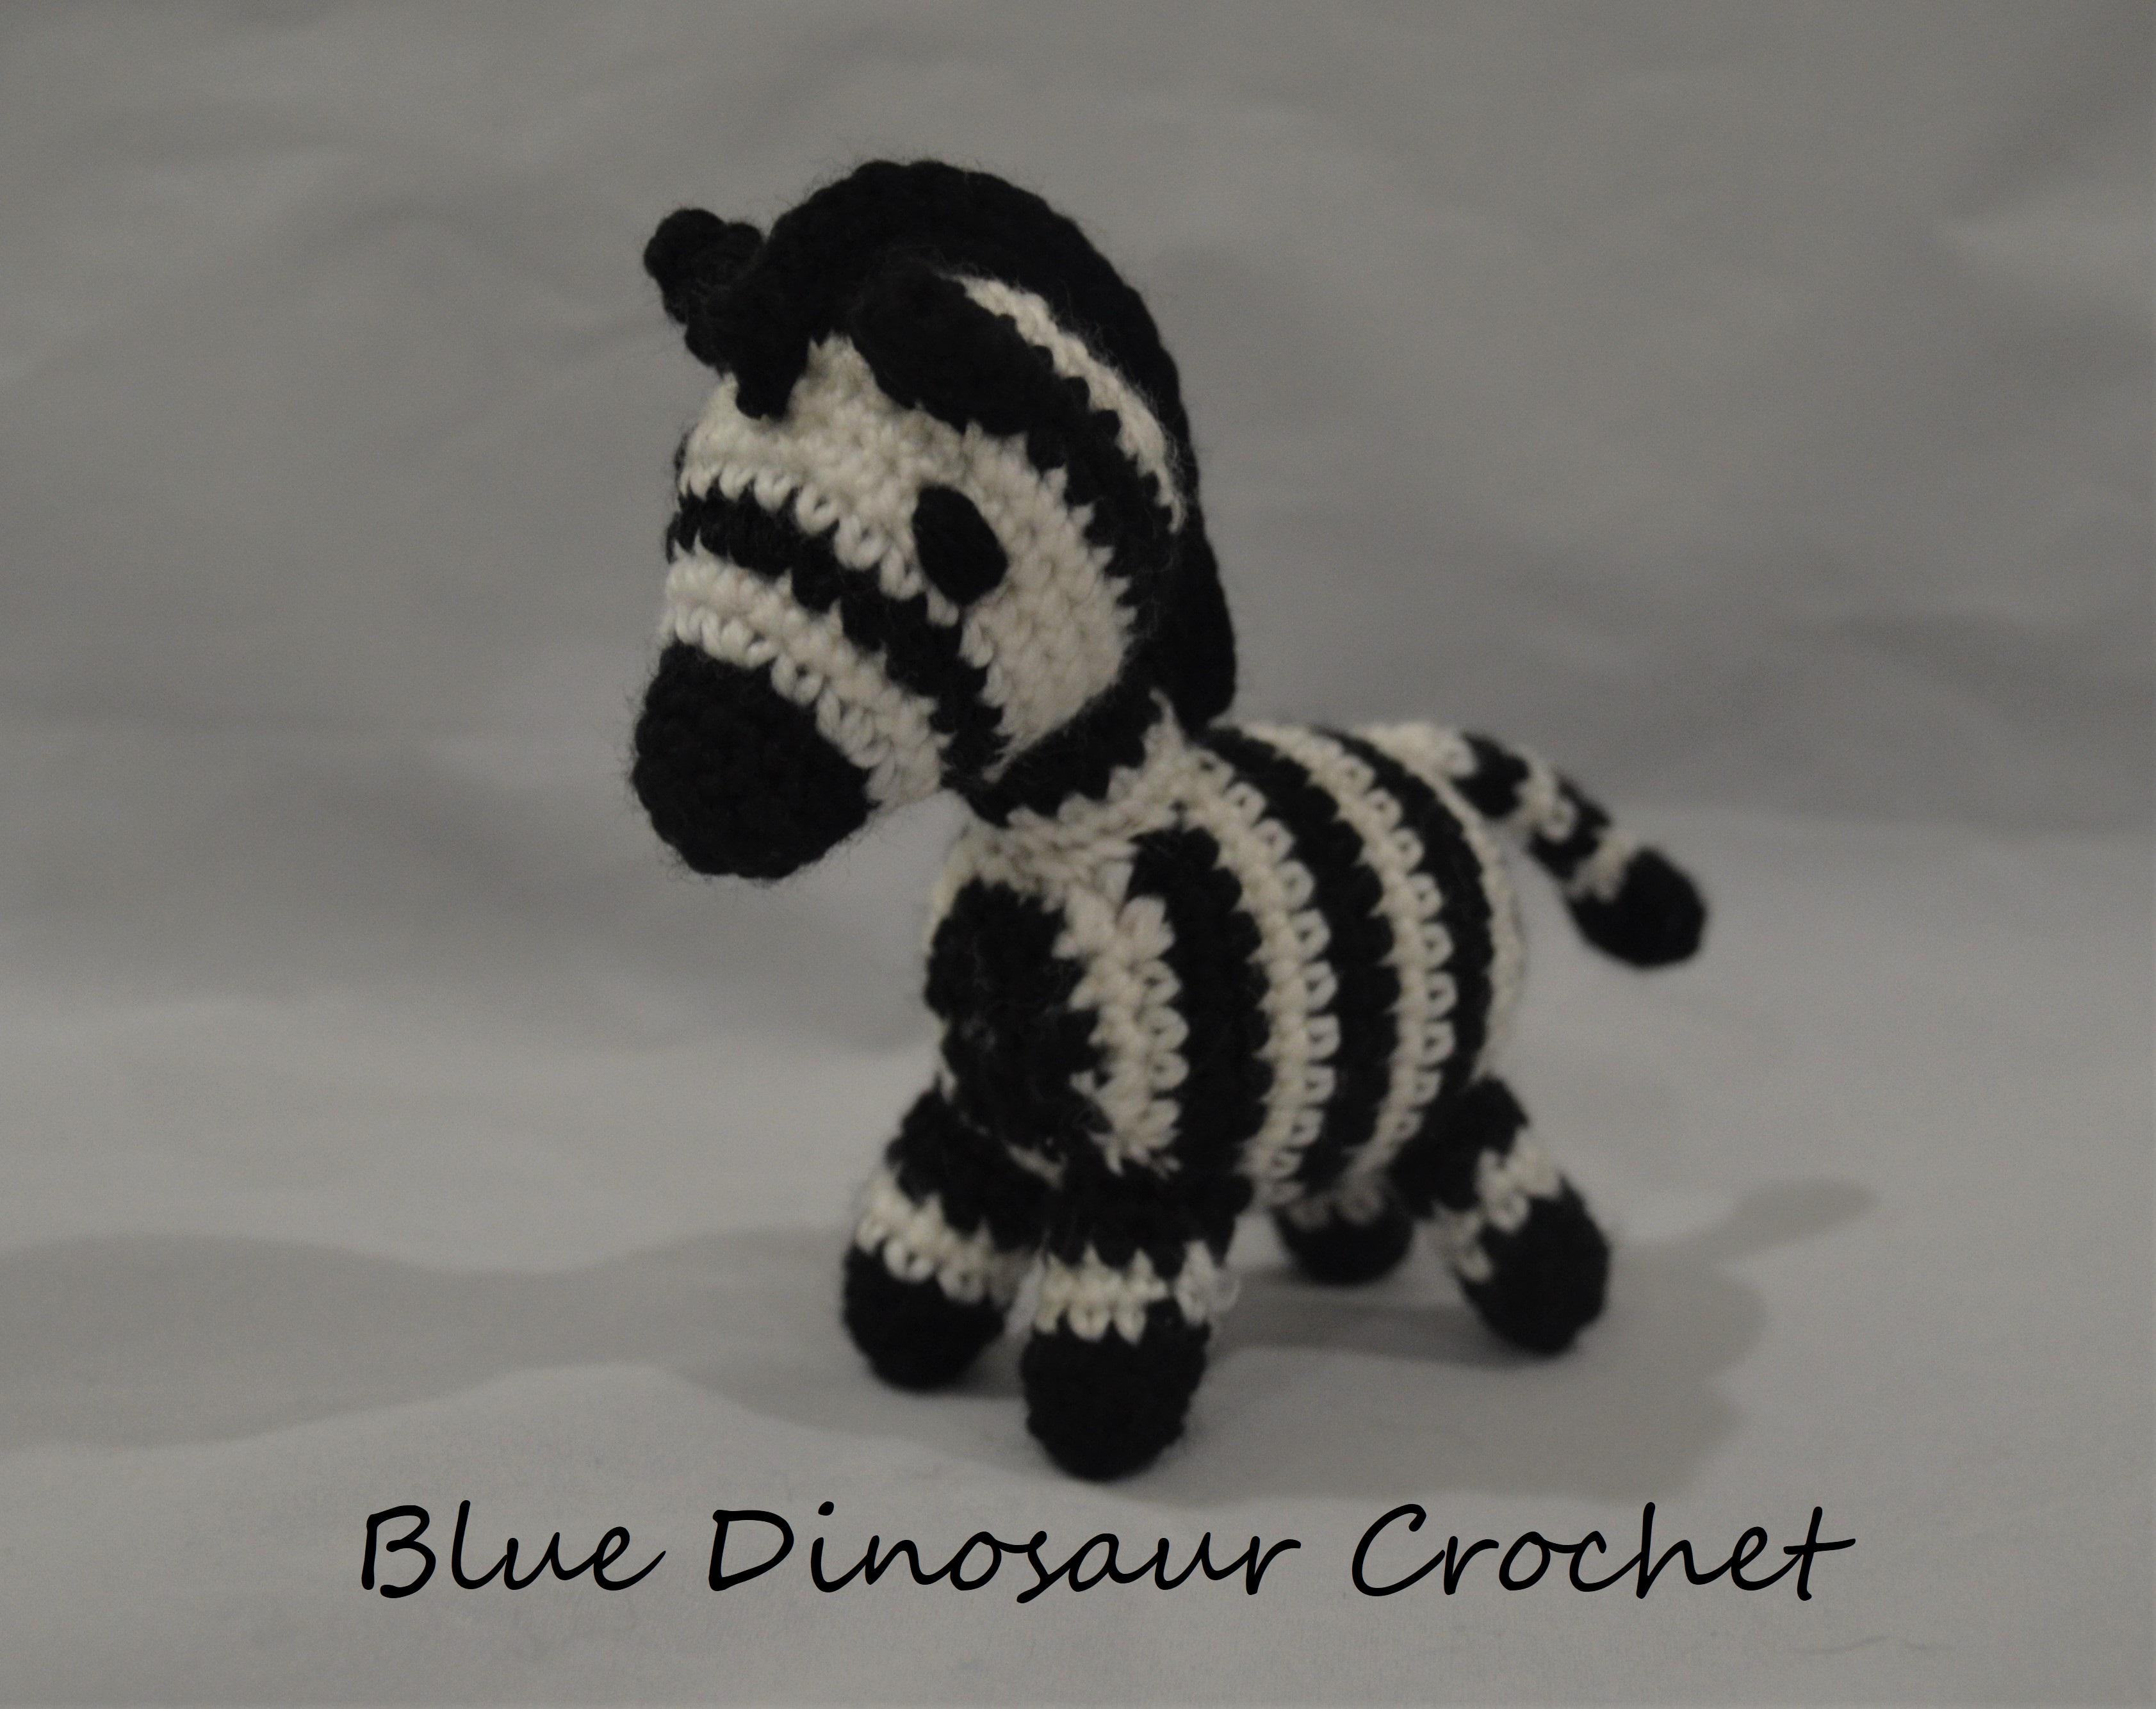 Amigurumi Zebra Free Crochet Pattern in 2020 (With images ... | 2668x3366